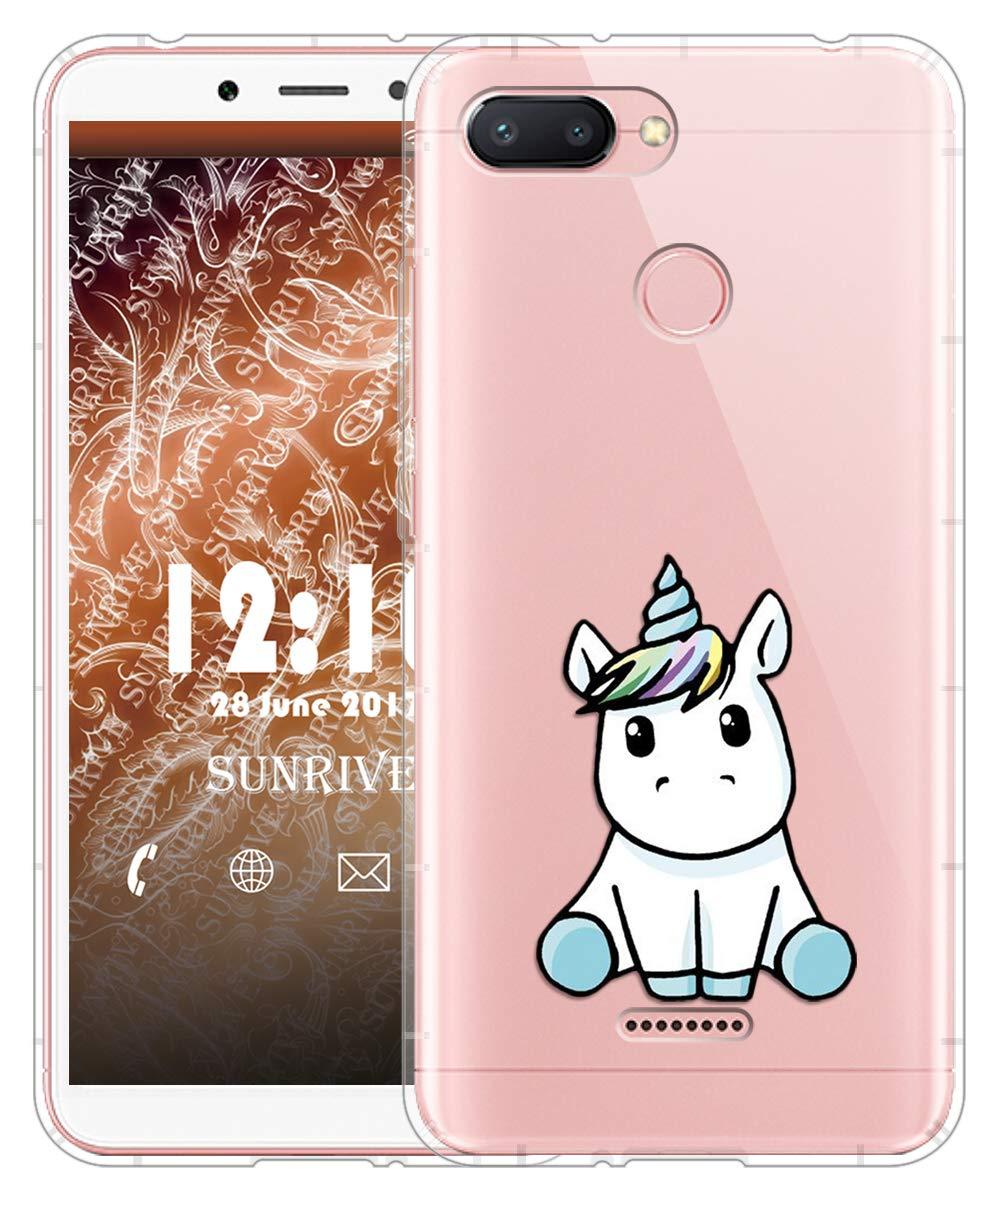 Sunrive Funda para Xiaomi Redmi S2, Silicona Slim Fit Gel Transparente Carcasa Case Bumper de Impactos y Anti-Arañazos Cojín de Aire Espalda Cover(TPU ...